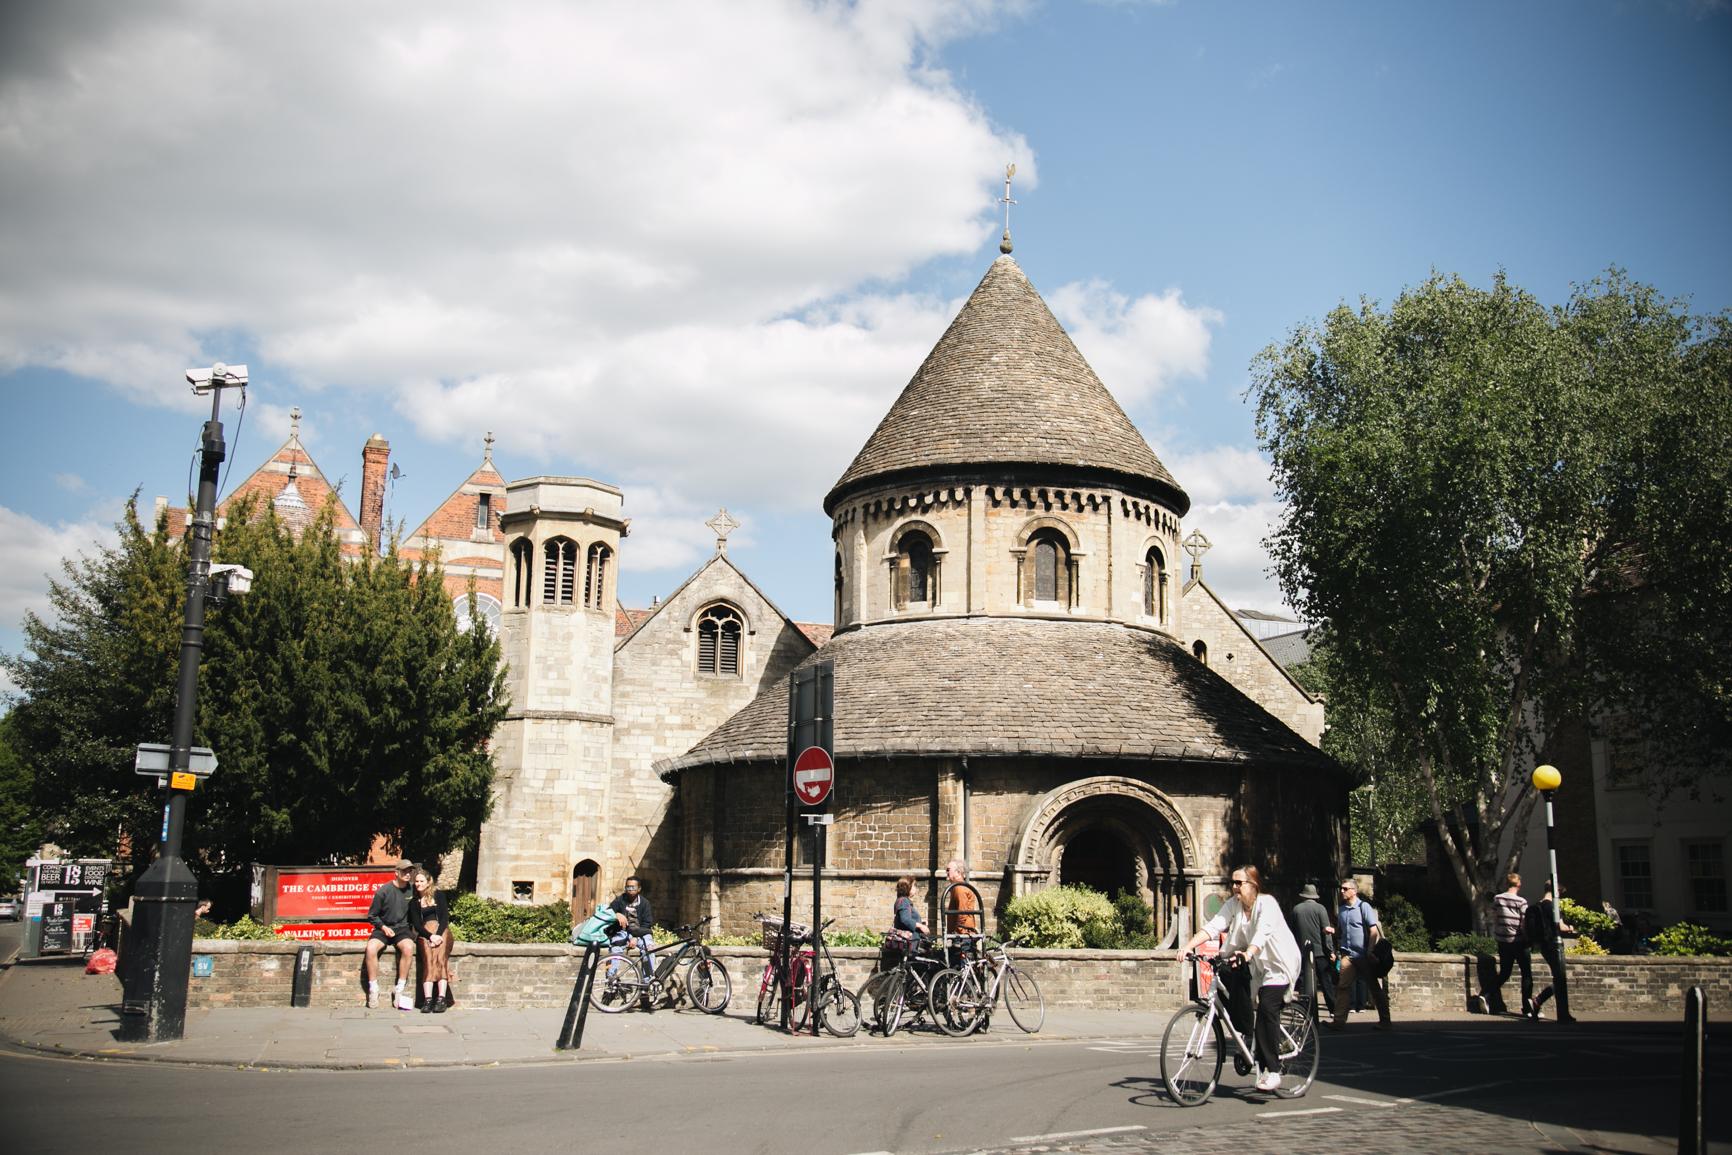 Eglise-st-Sepulcre-the-round-church-Cambridge-patrimoine.jpg